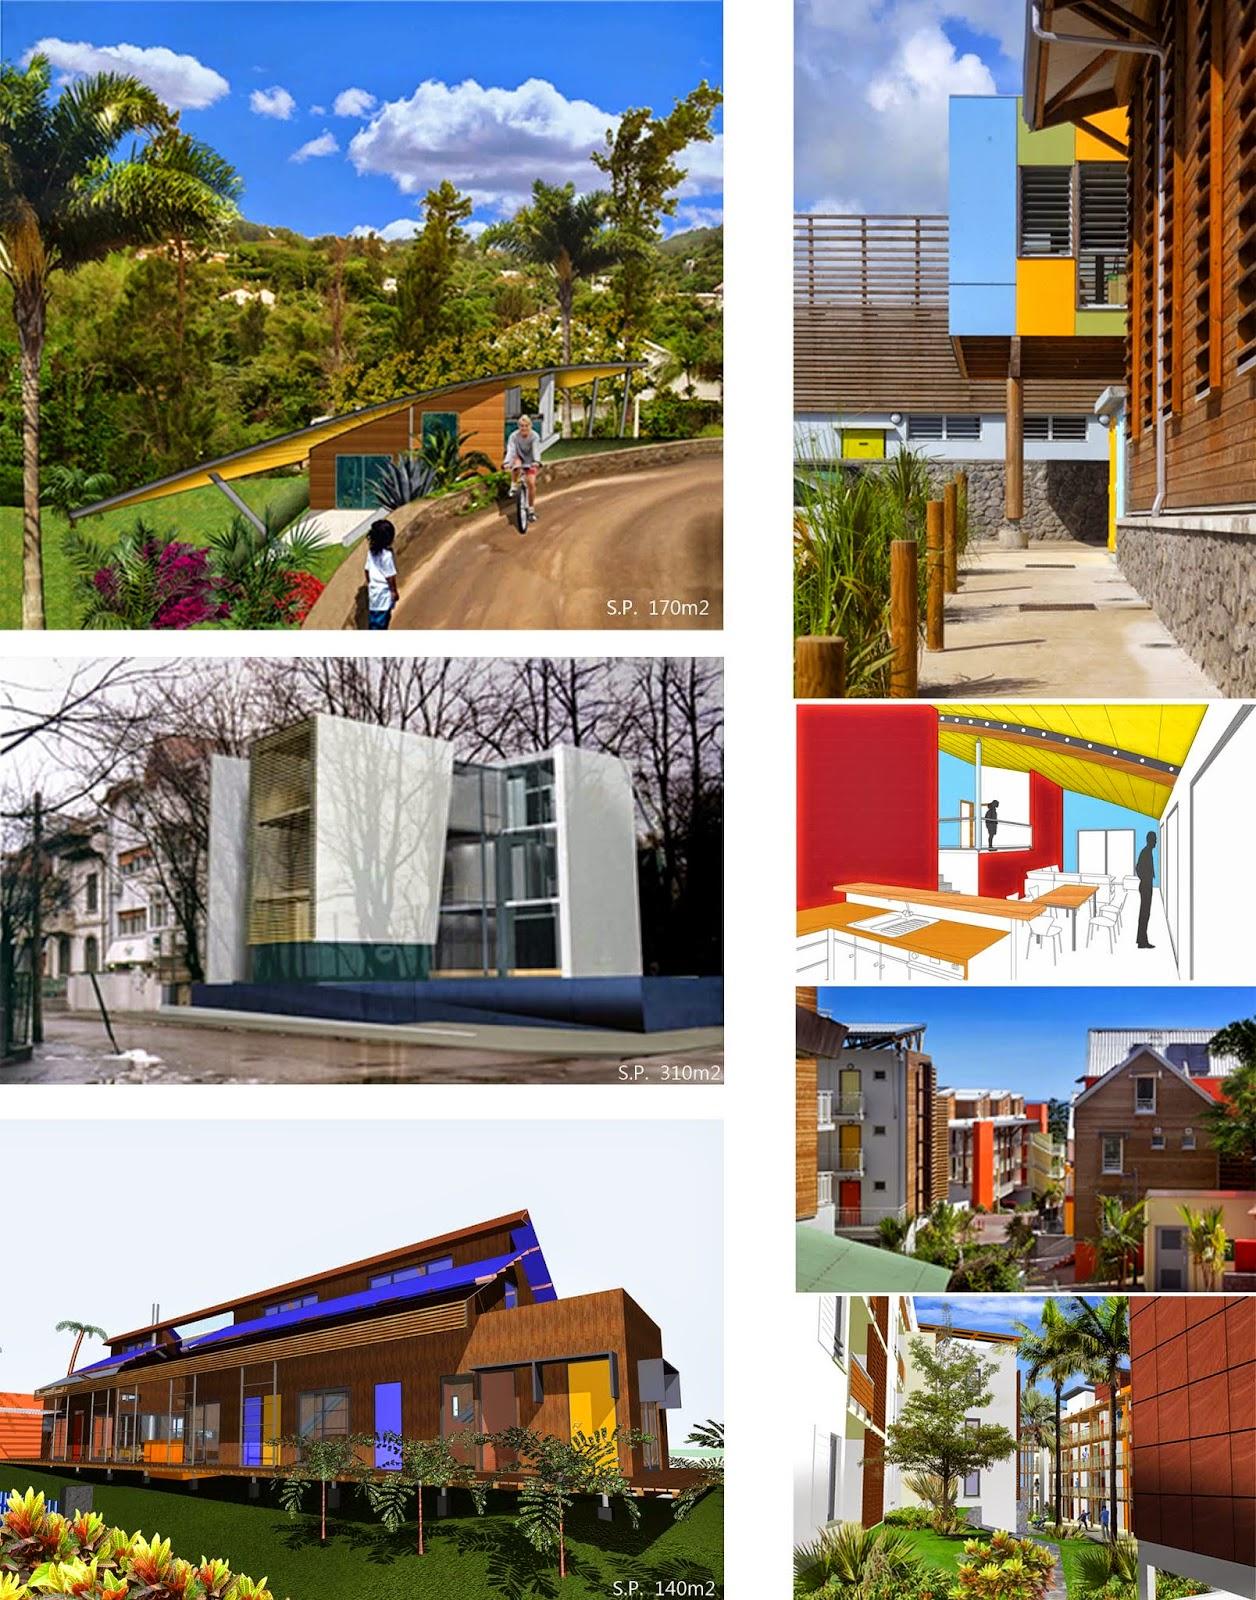 dana siman architecte  dsa  2012